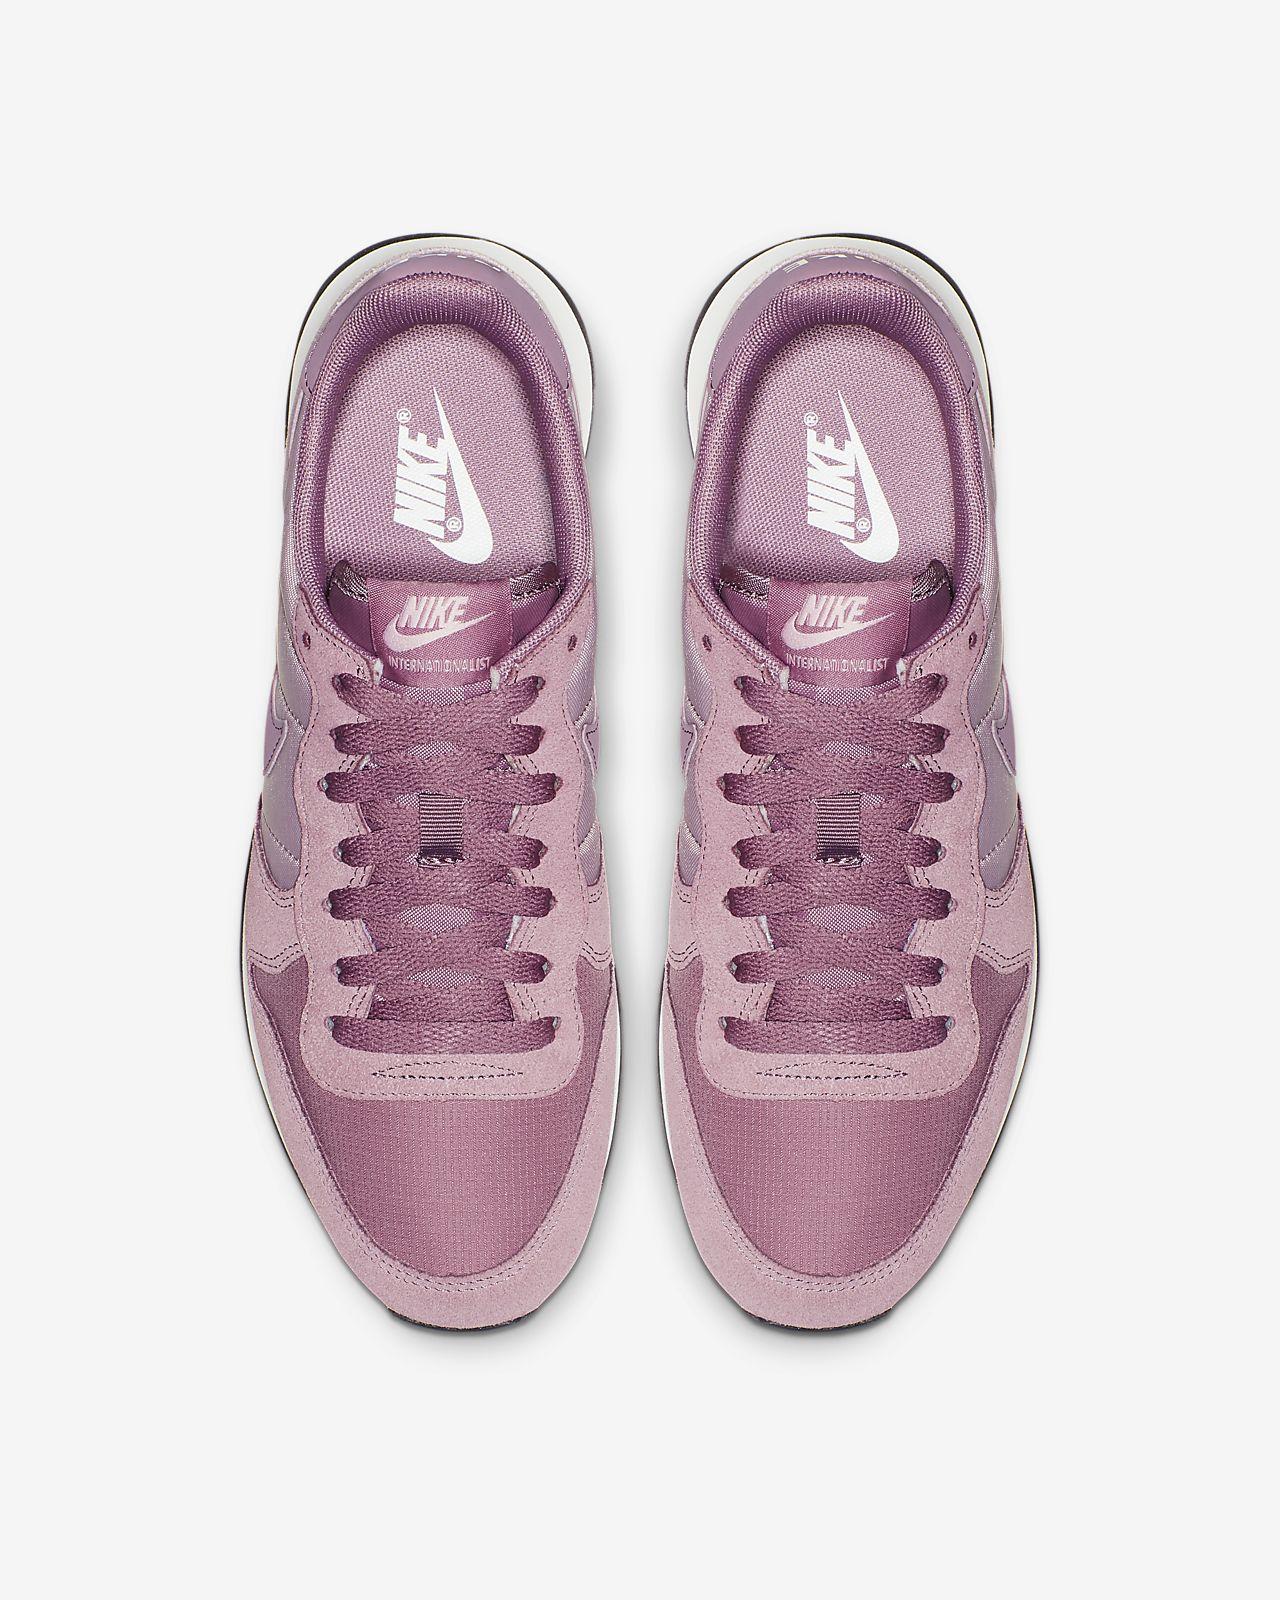 88ce163a314f Low Resolution Nike Internationalist Women s Shoe Nike Internationalist  Women s Shoe